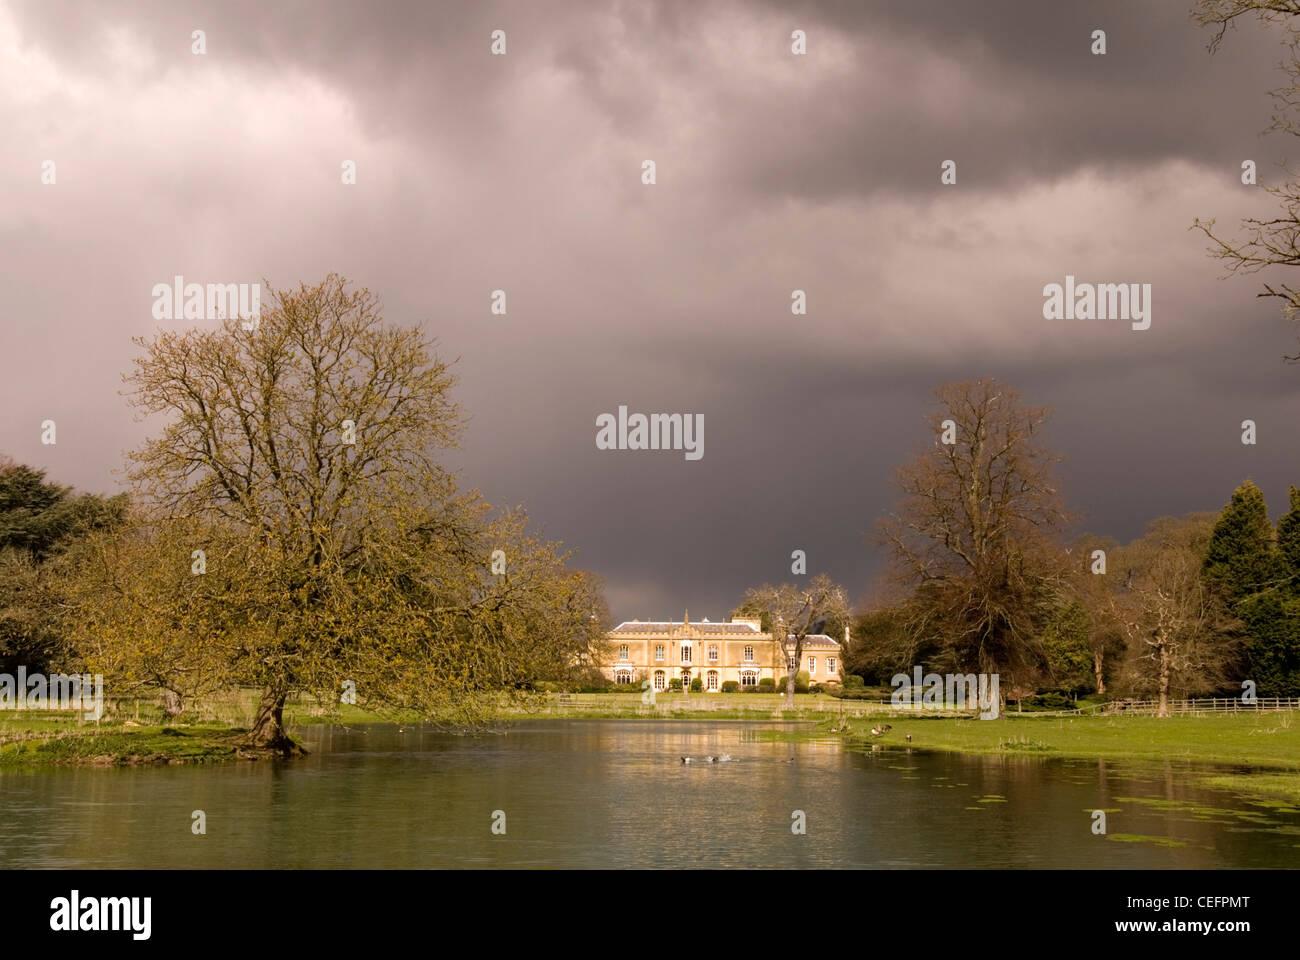 Great Missenden - Bucks - Missenden Abbey - seen across a lake - sunlight -  storm clouds approaching - Stock Image